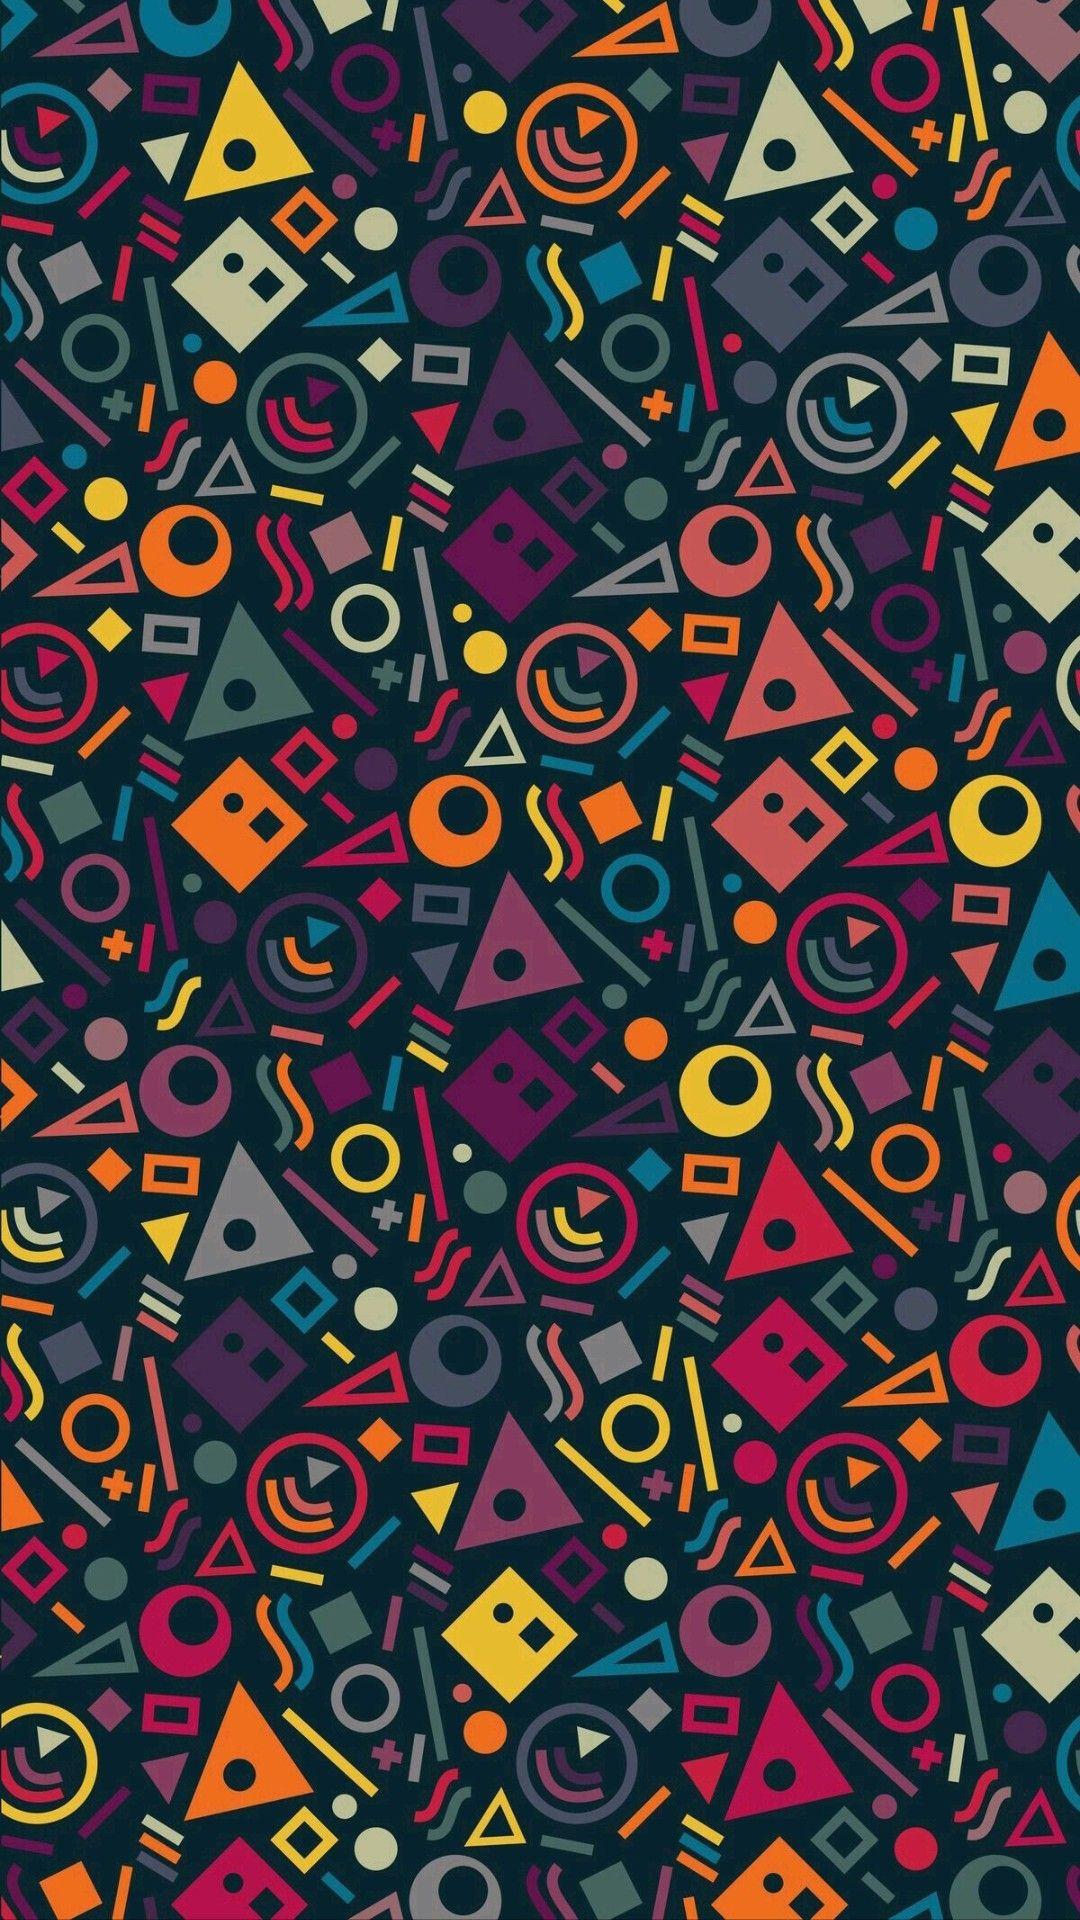 Pin by Sirpy on Tj | Pattern wallpaper, Iphone wallpaper